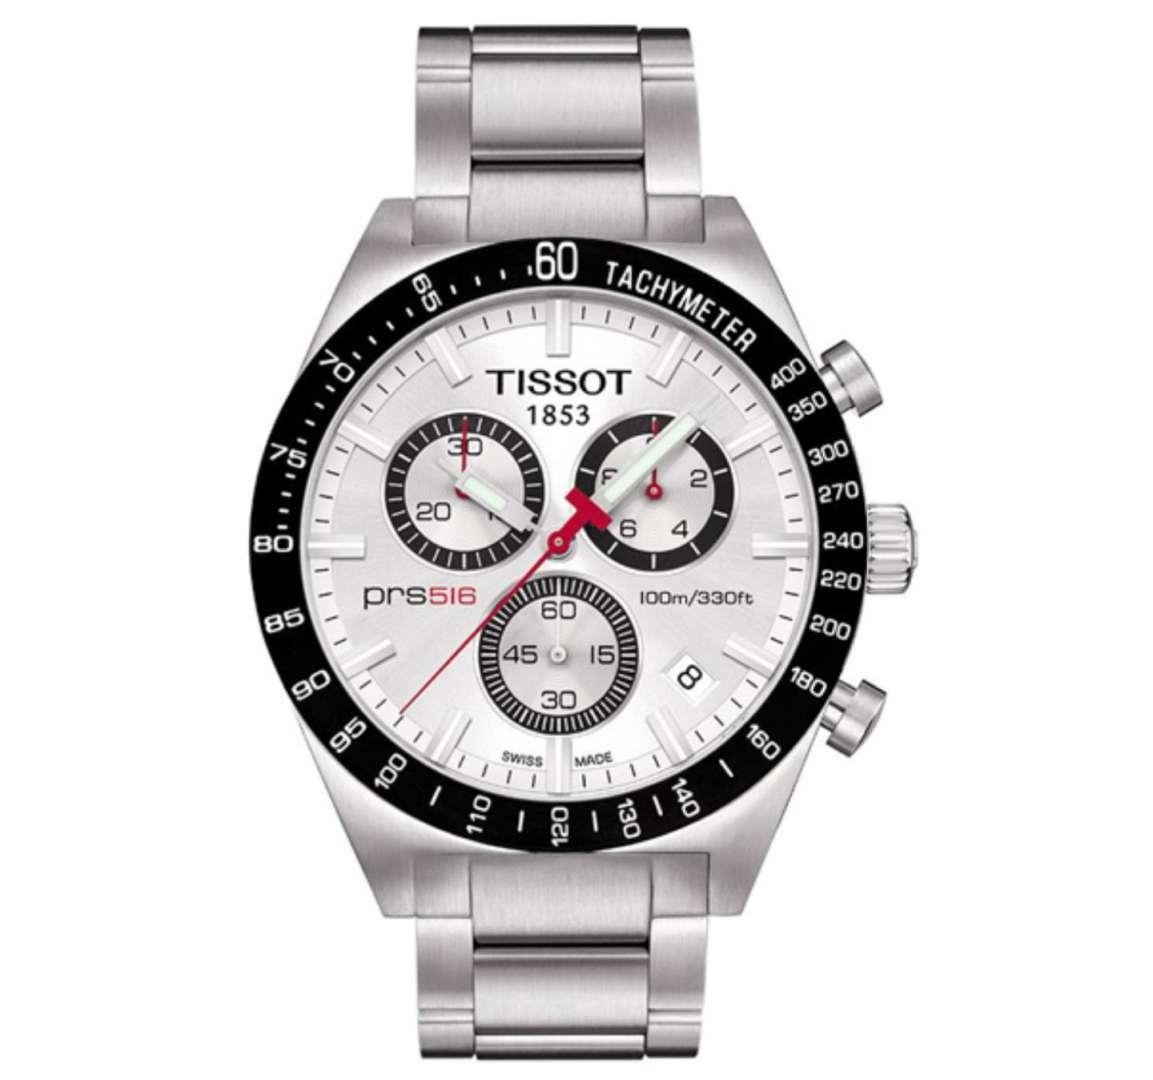 שעון יד אנלוגי tissot t044.417.21.031.00 טיסו